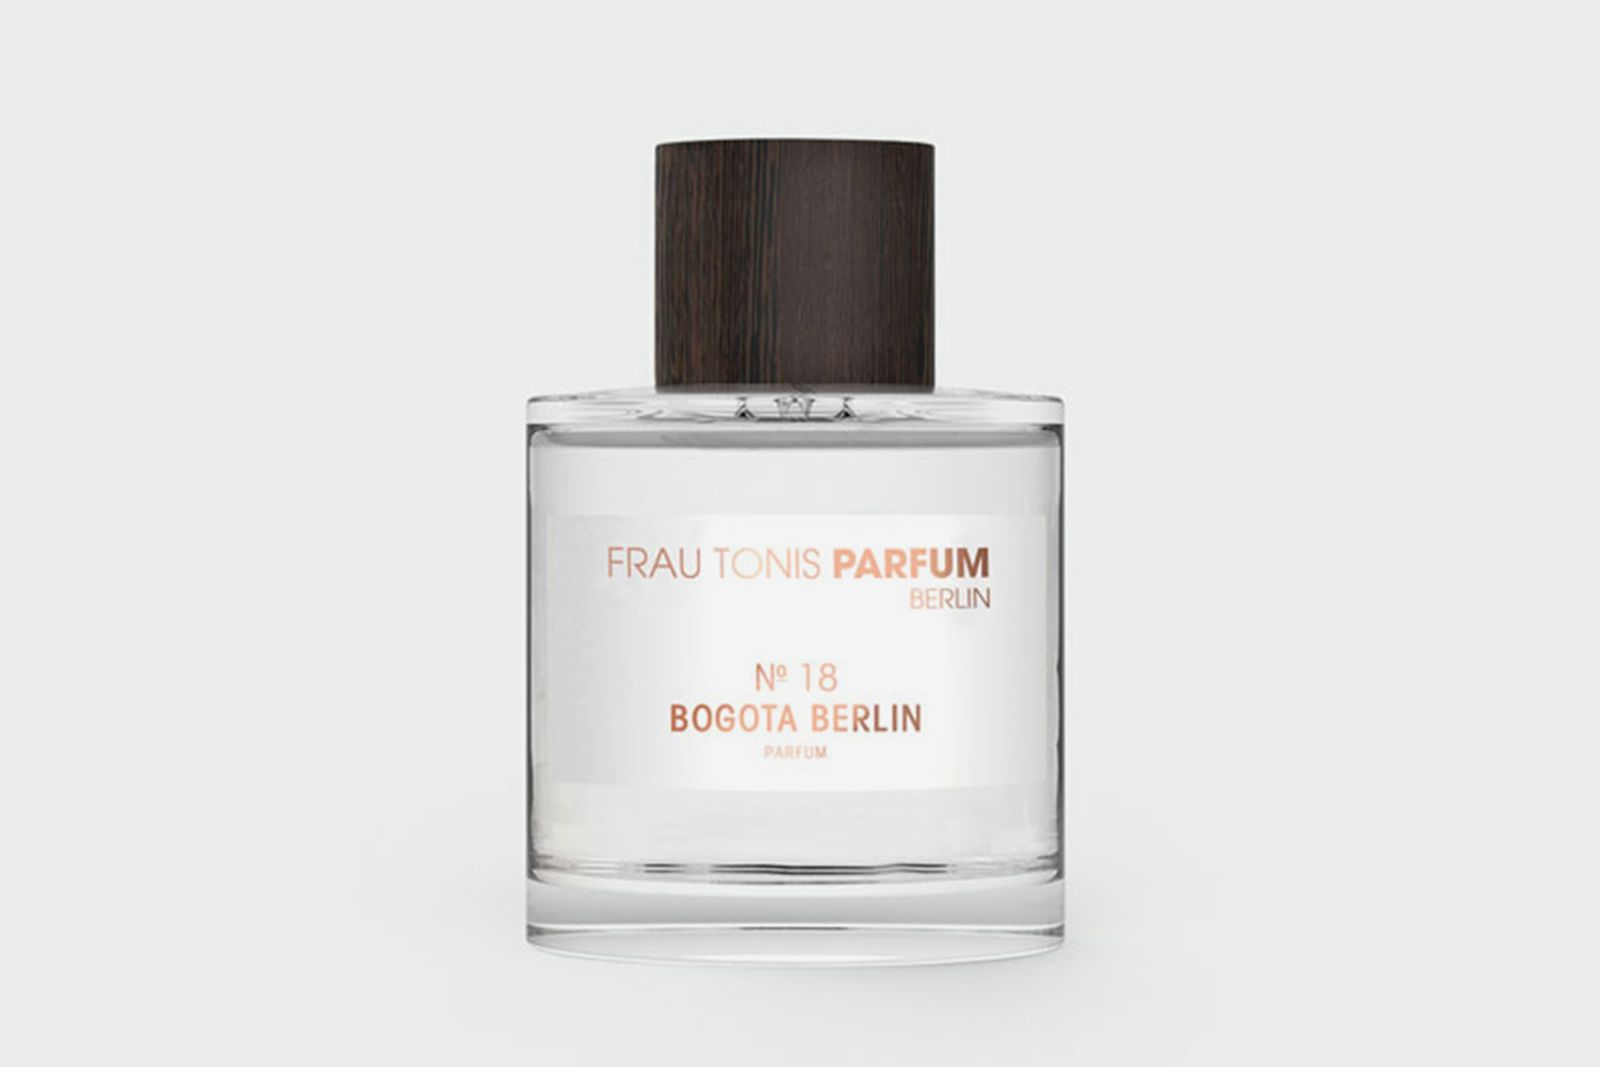 18 parfum bogota berlin frau tonis parfum onlineshop(1) ace hotel